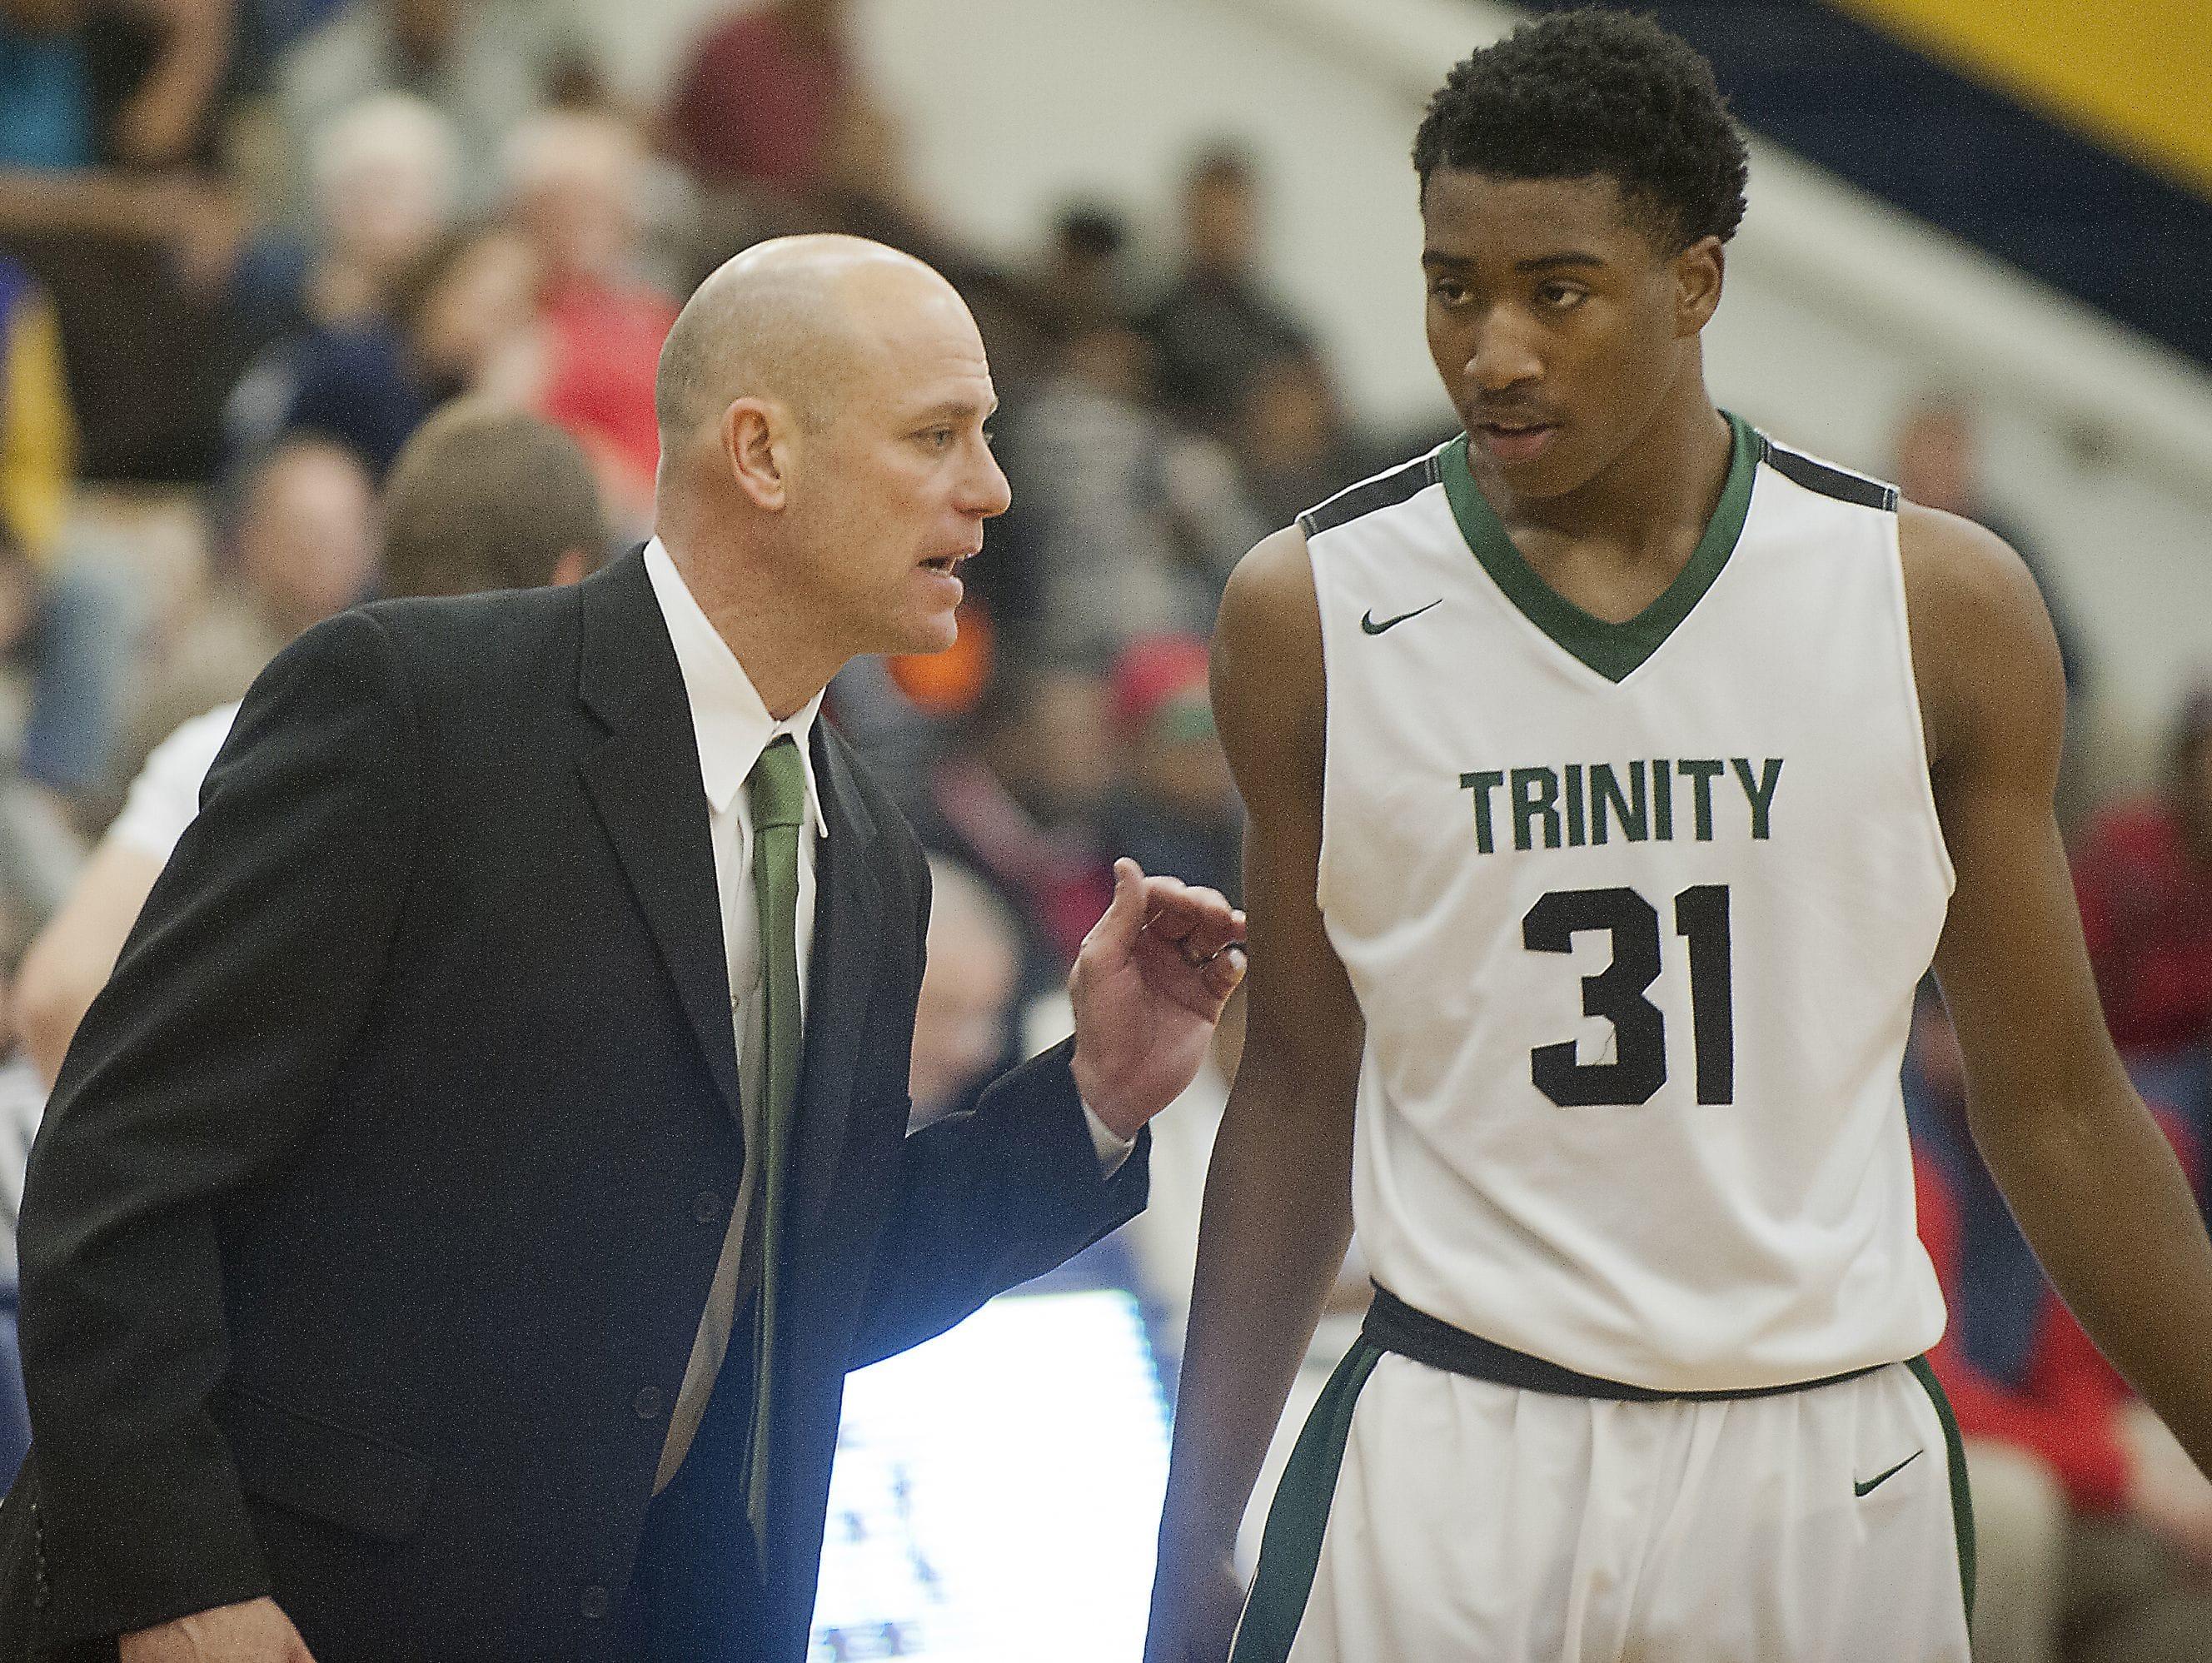 Trinity head basketball coach Mike Szabo talks to Trinity forward Jay Scrubb during a break in the action. 20 December 2016